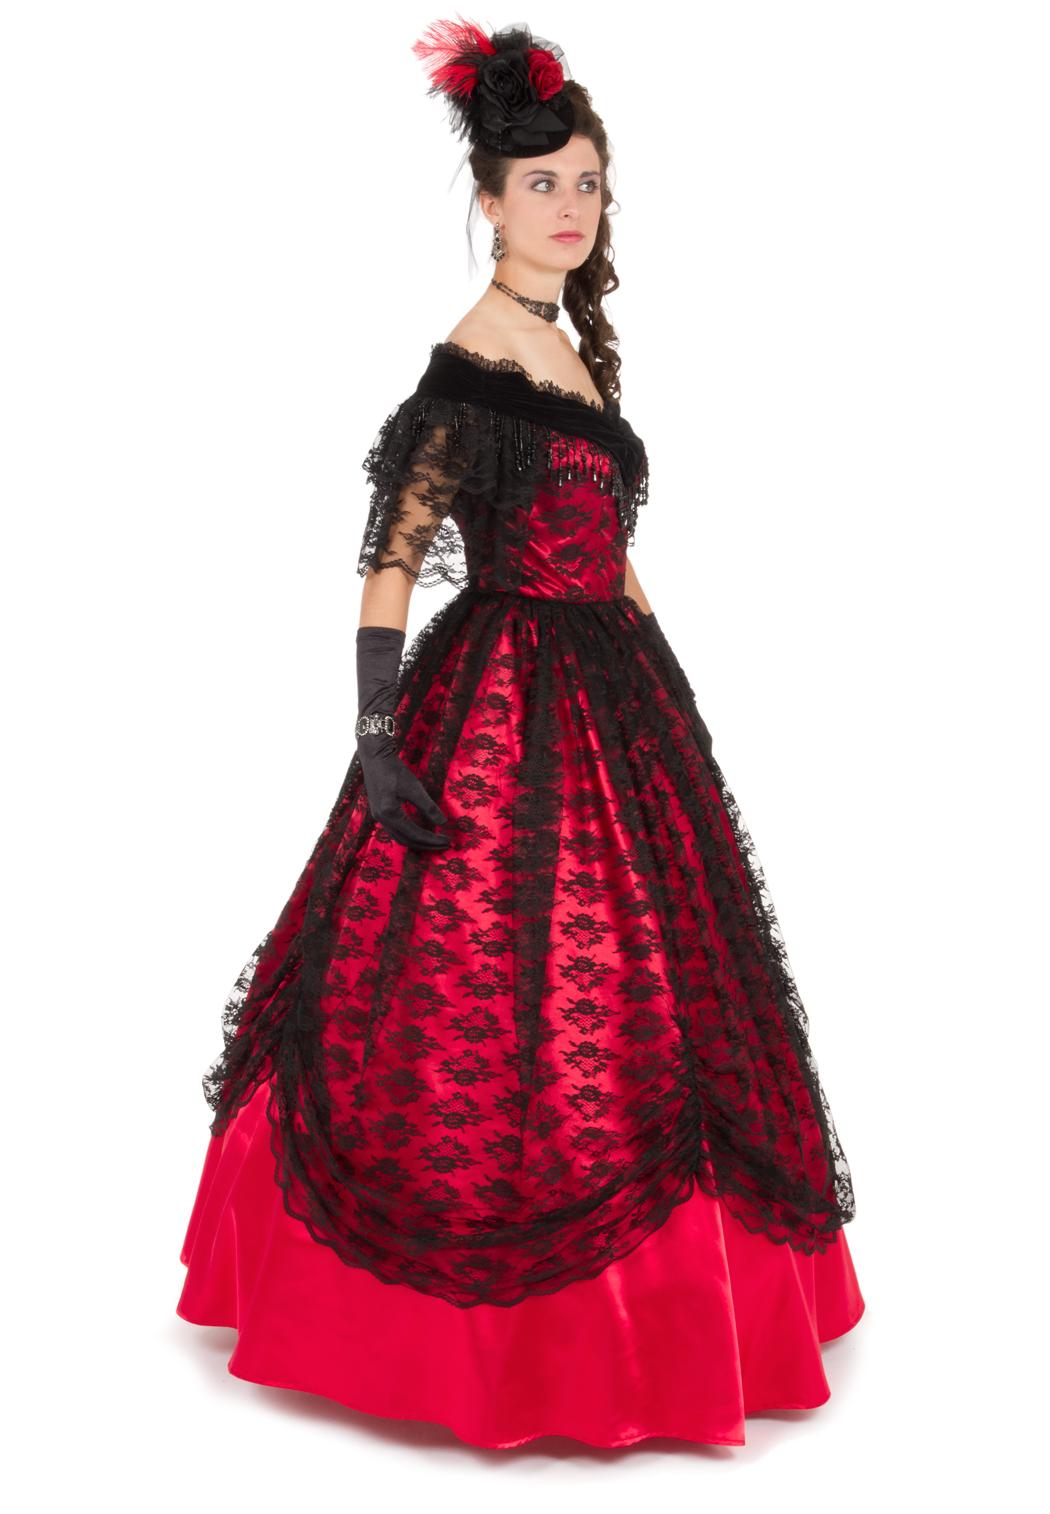 Satin Victorian Civil War Ballgown | Recollections